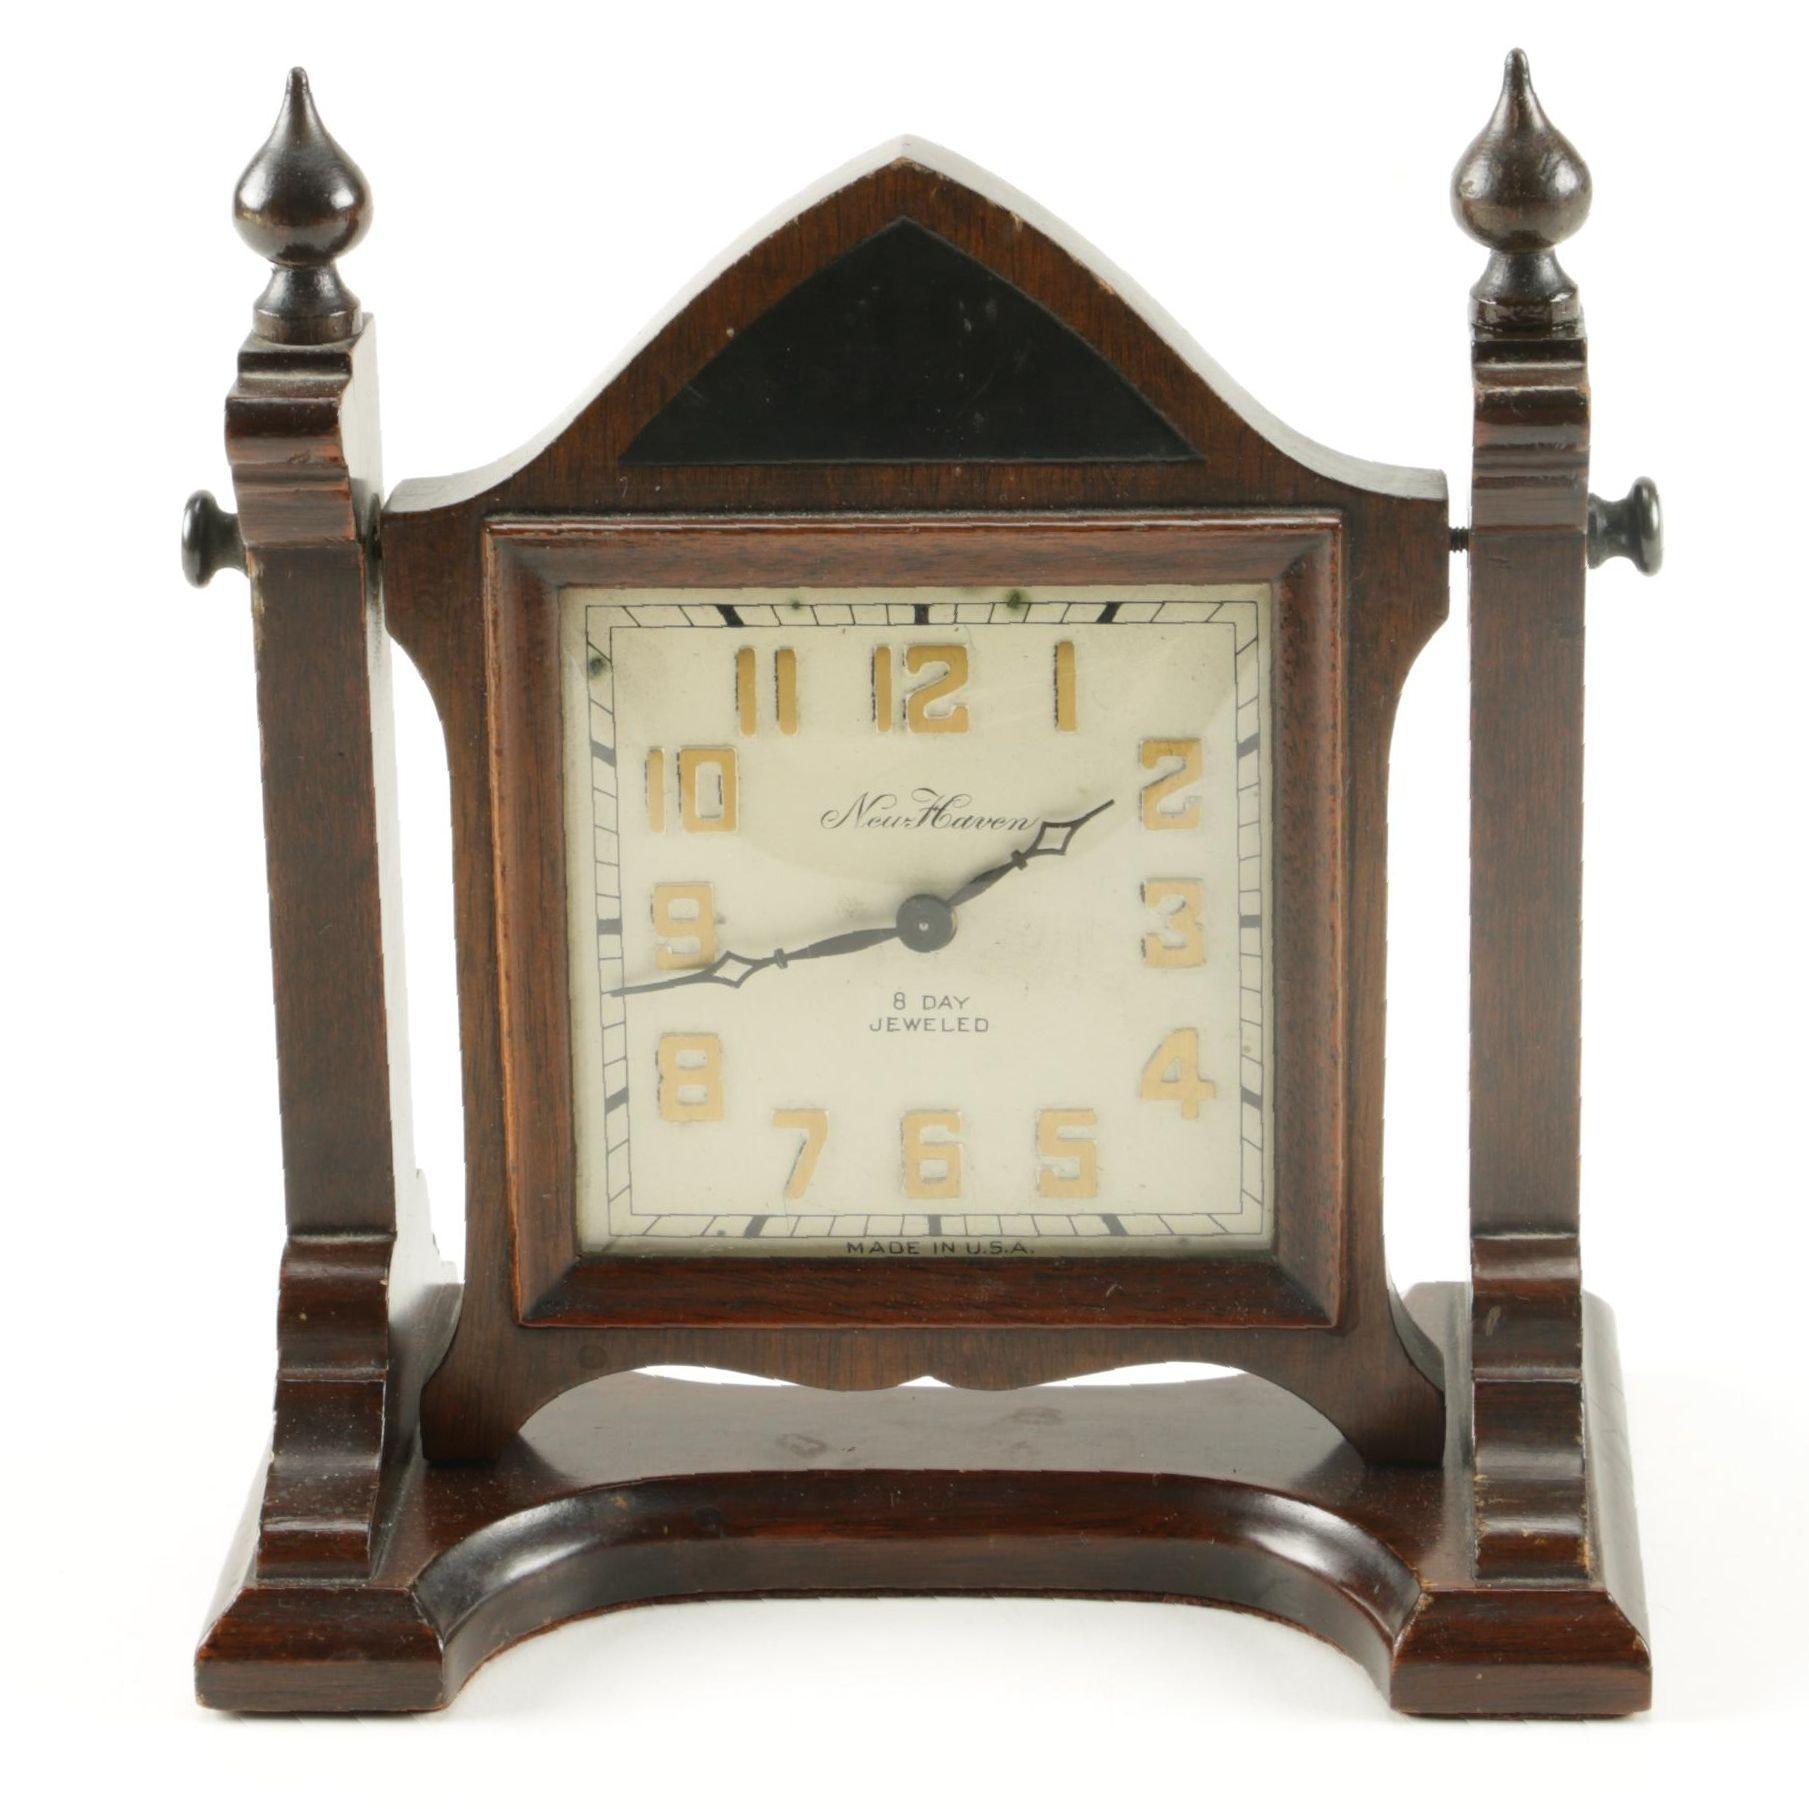 New Haven Jeweled Mantel Clock